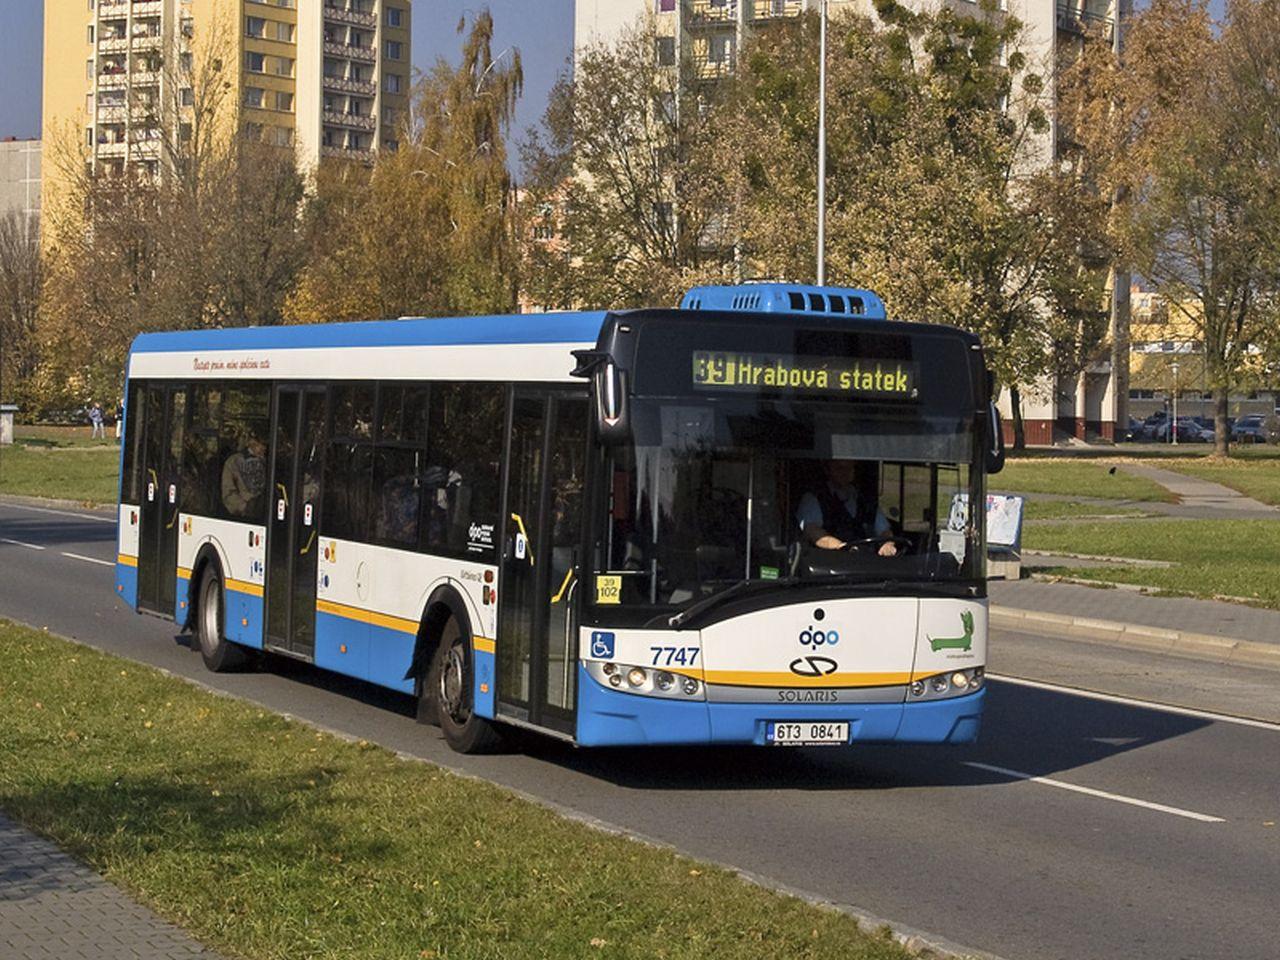 Autobus Solaris Urbino 12 v barvách DPO. Foto: Dopravní podnik Ostrava